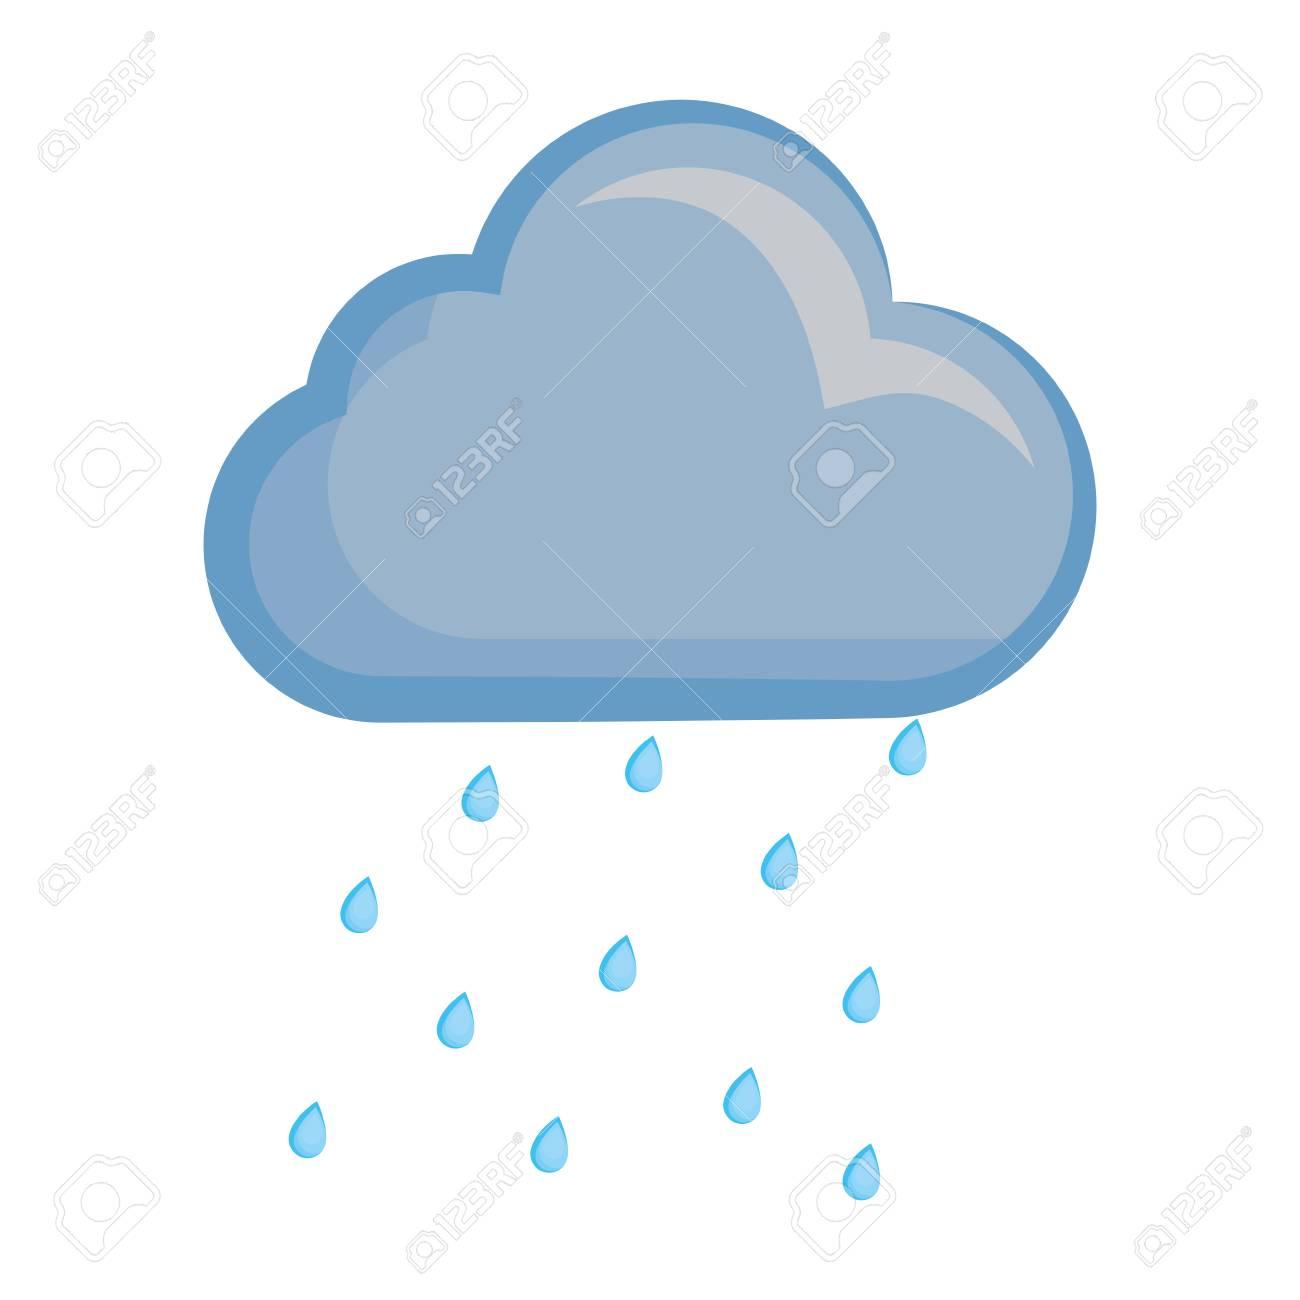 Cloud weather symbol cartoon - 92594966